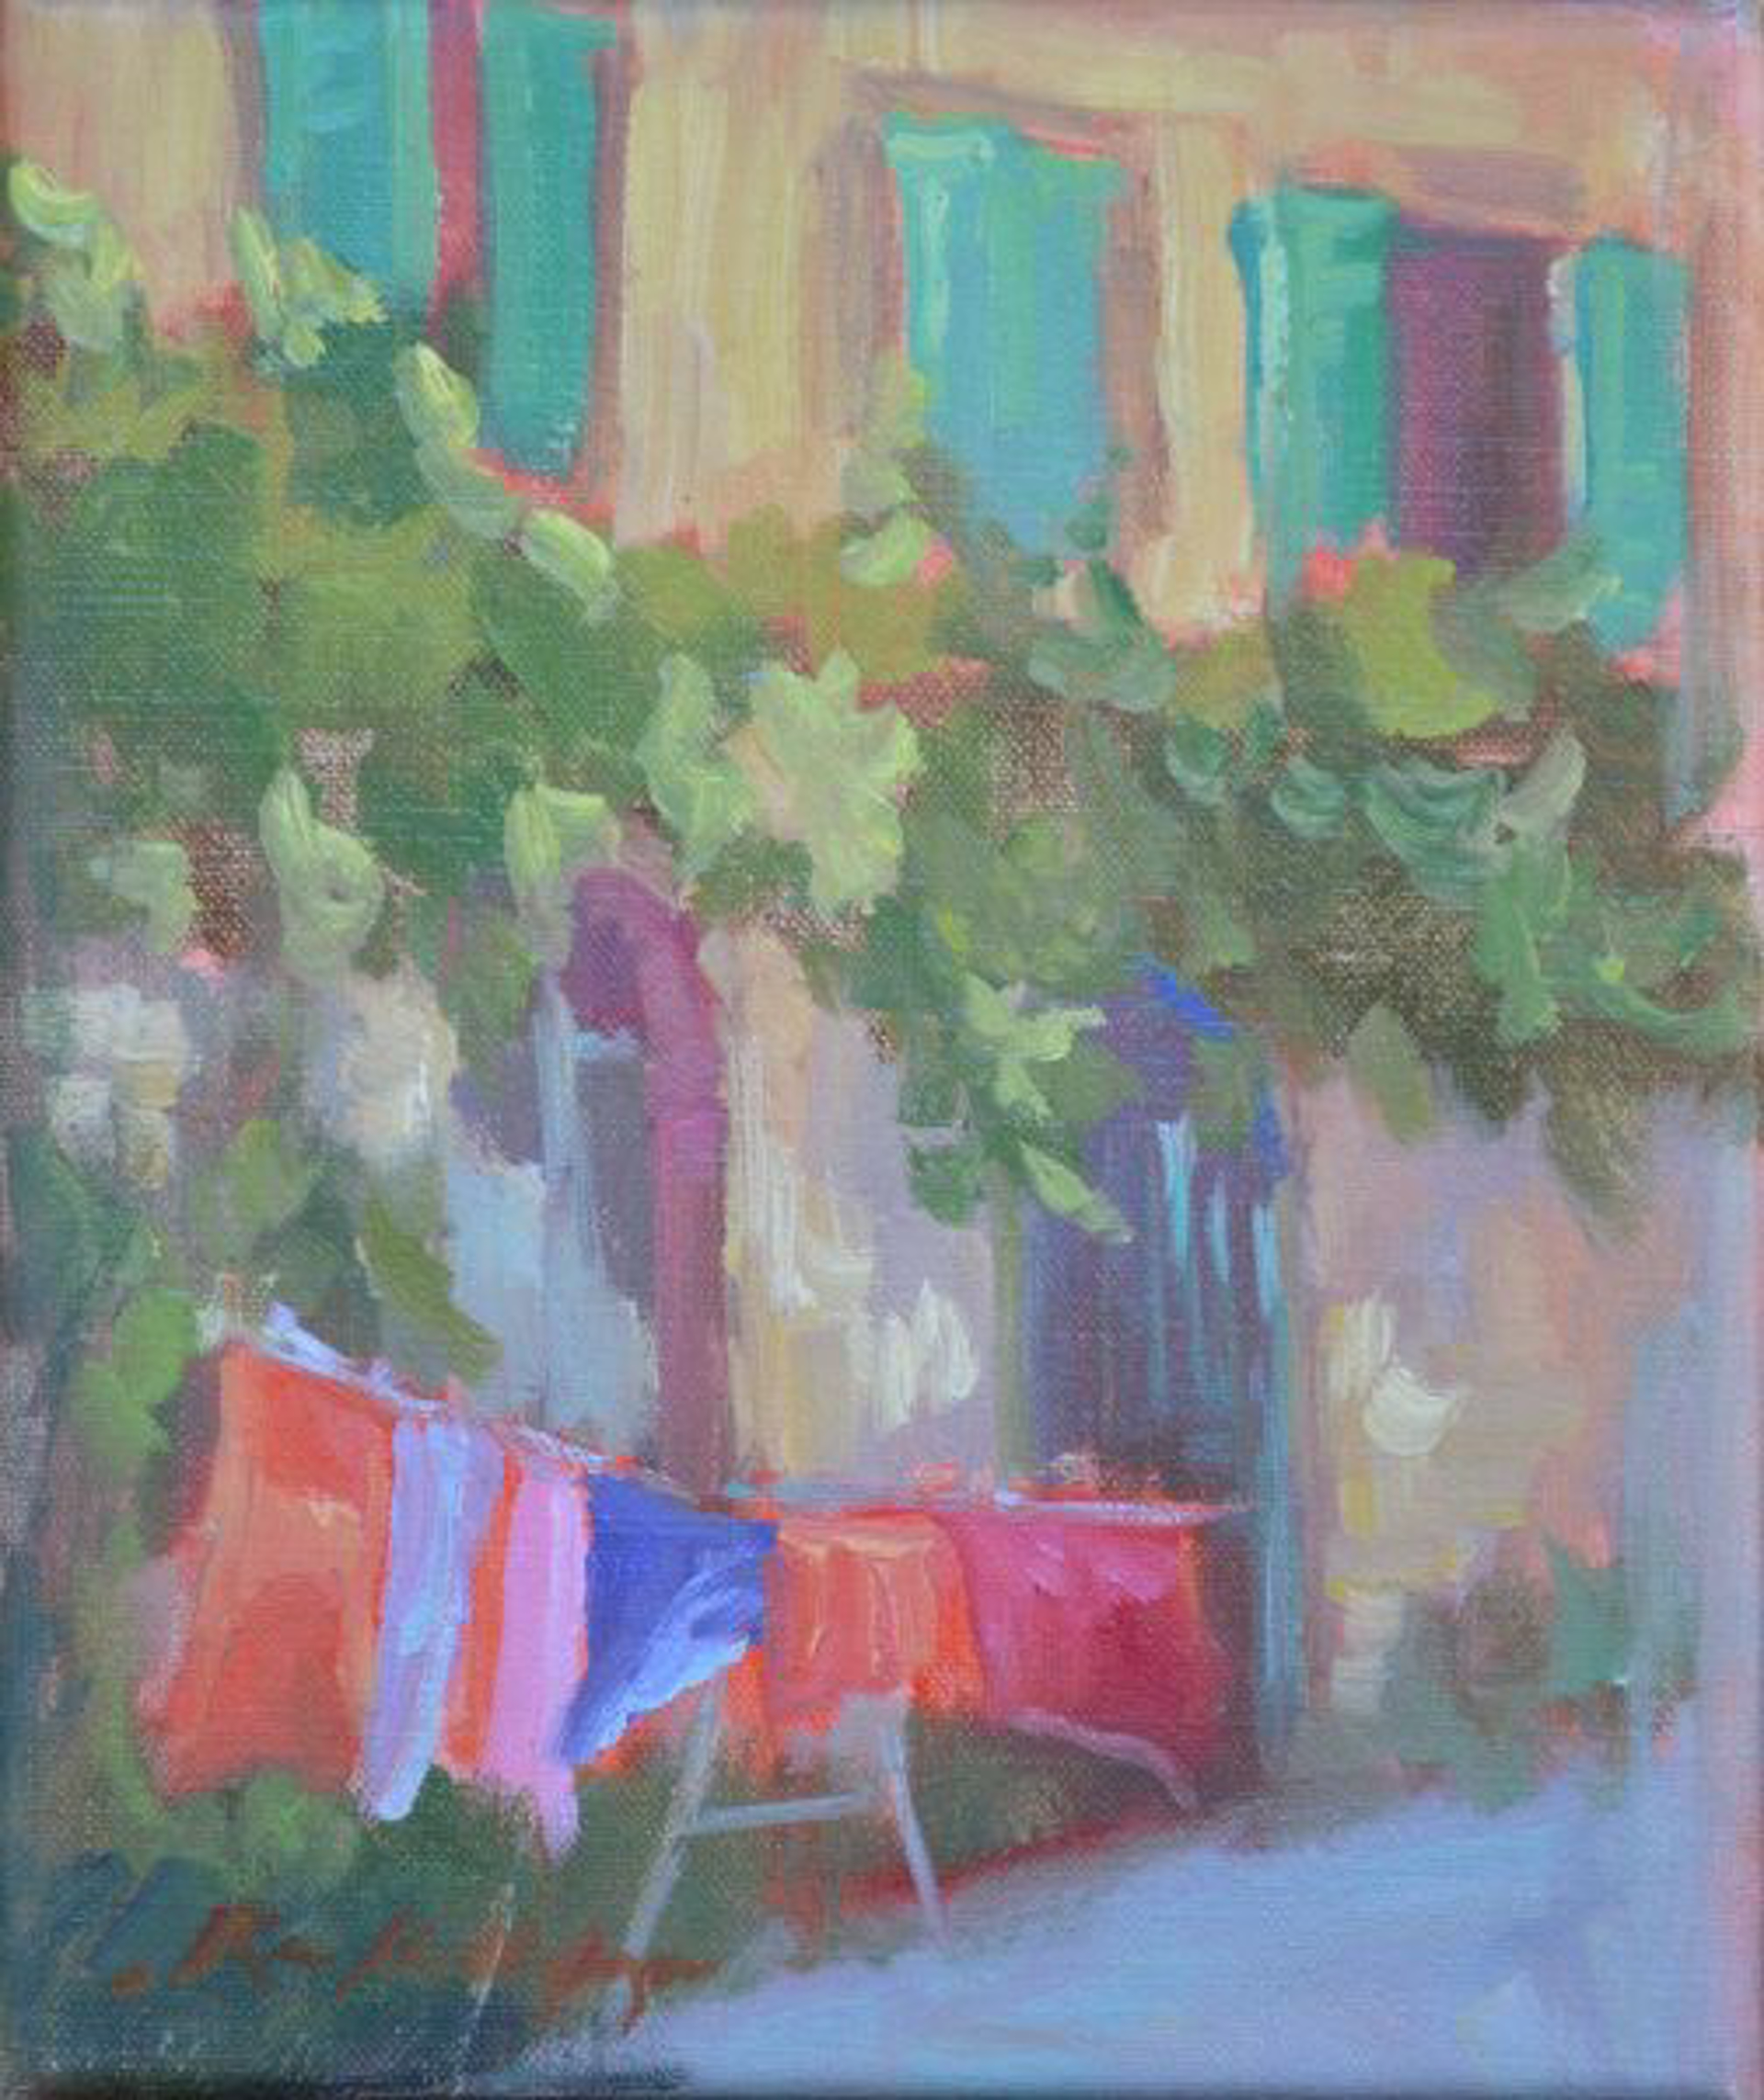 Italian Laundry by Karen Hewitt Hagan